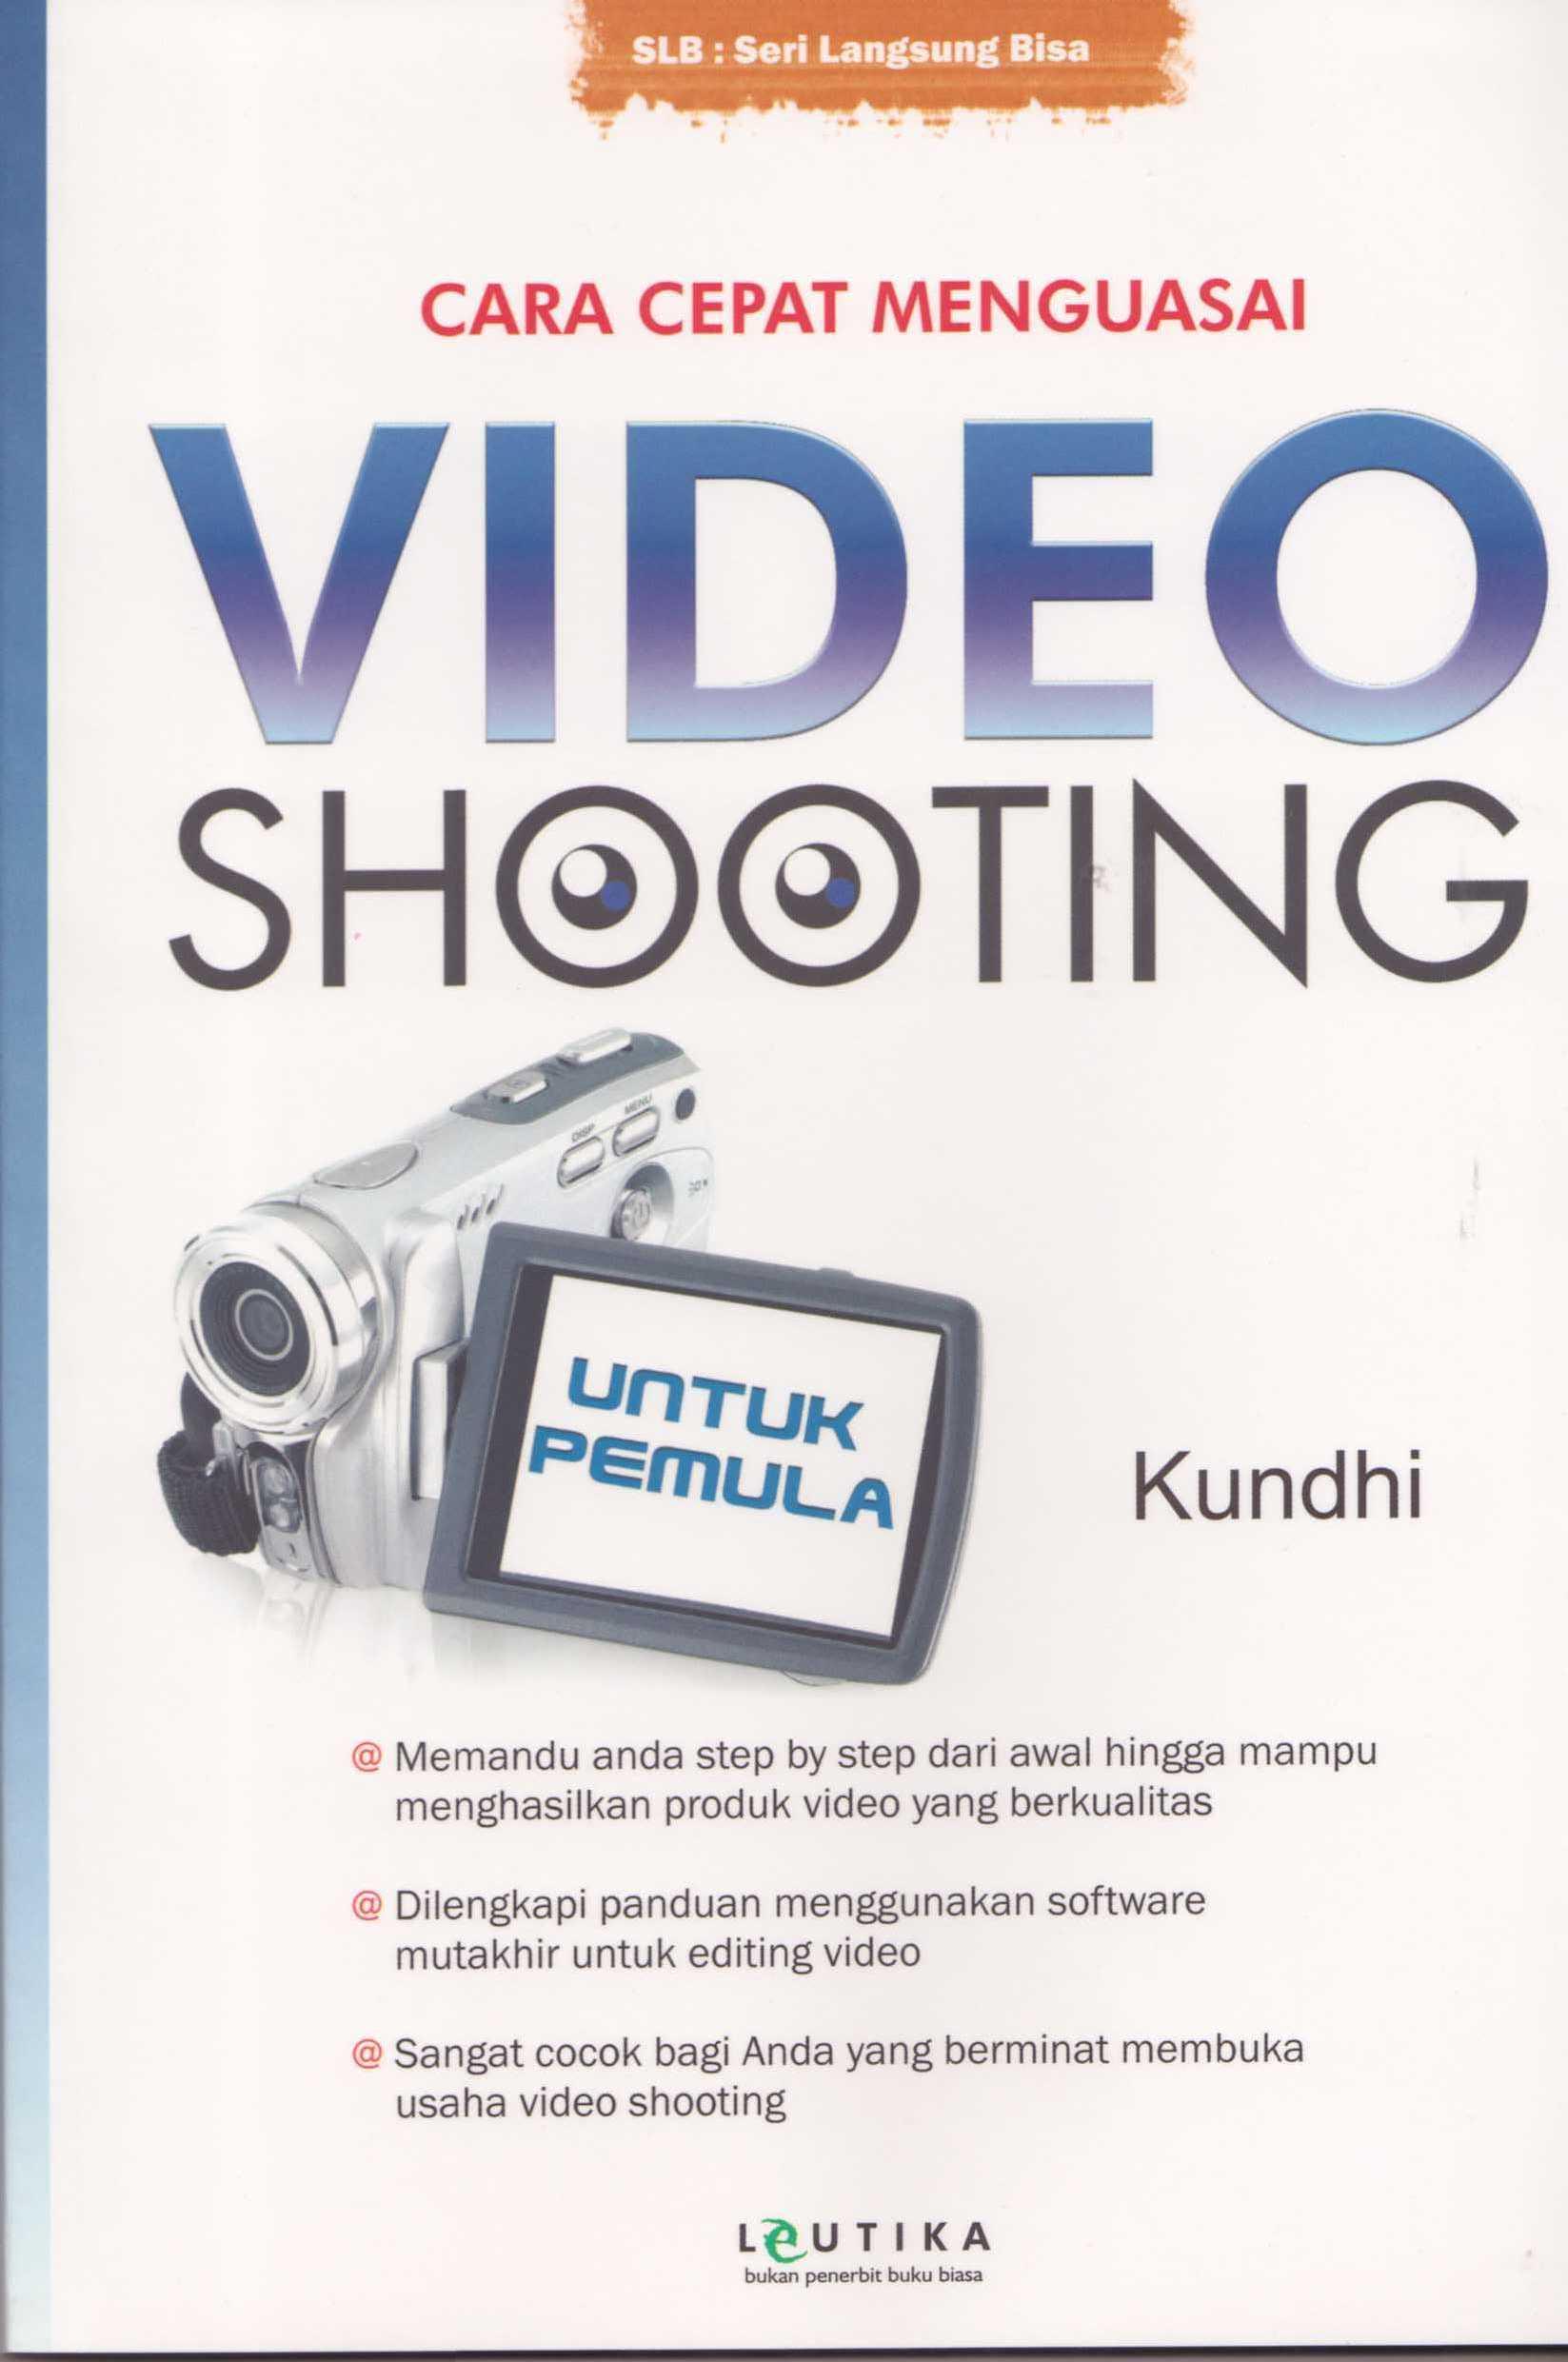 Video Shoting045